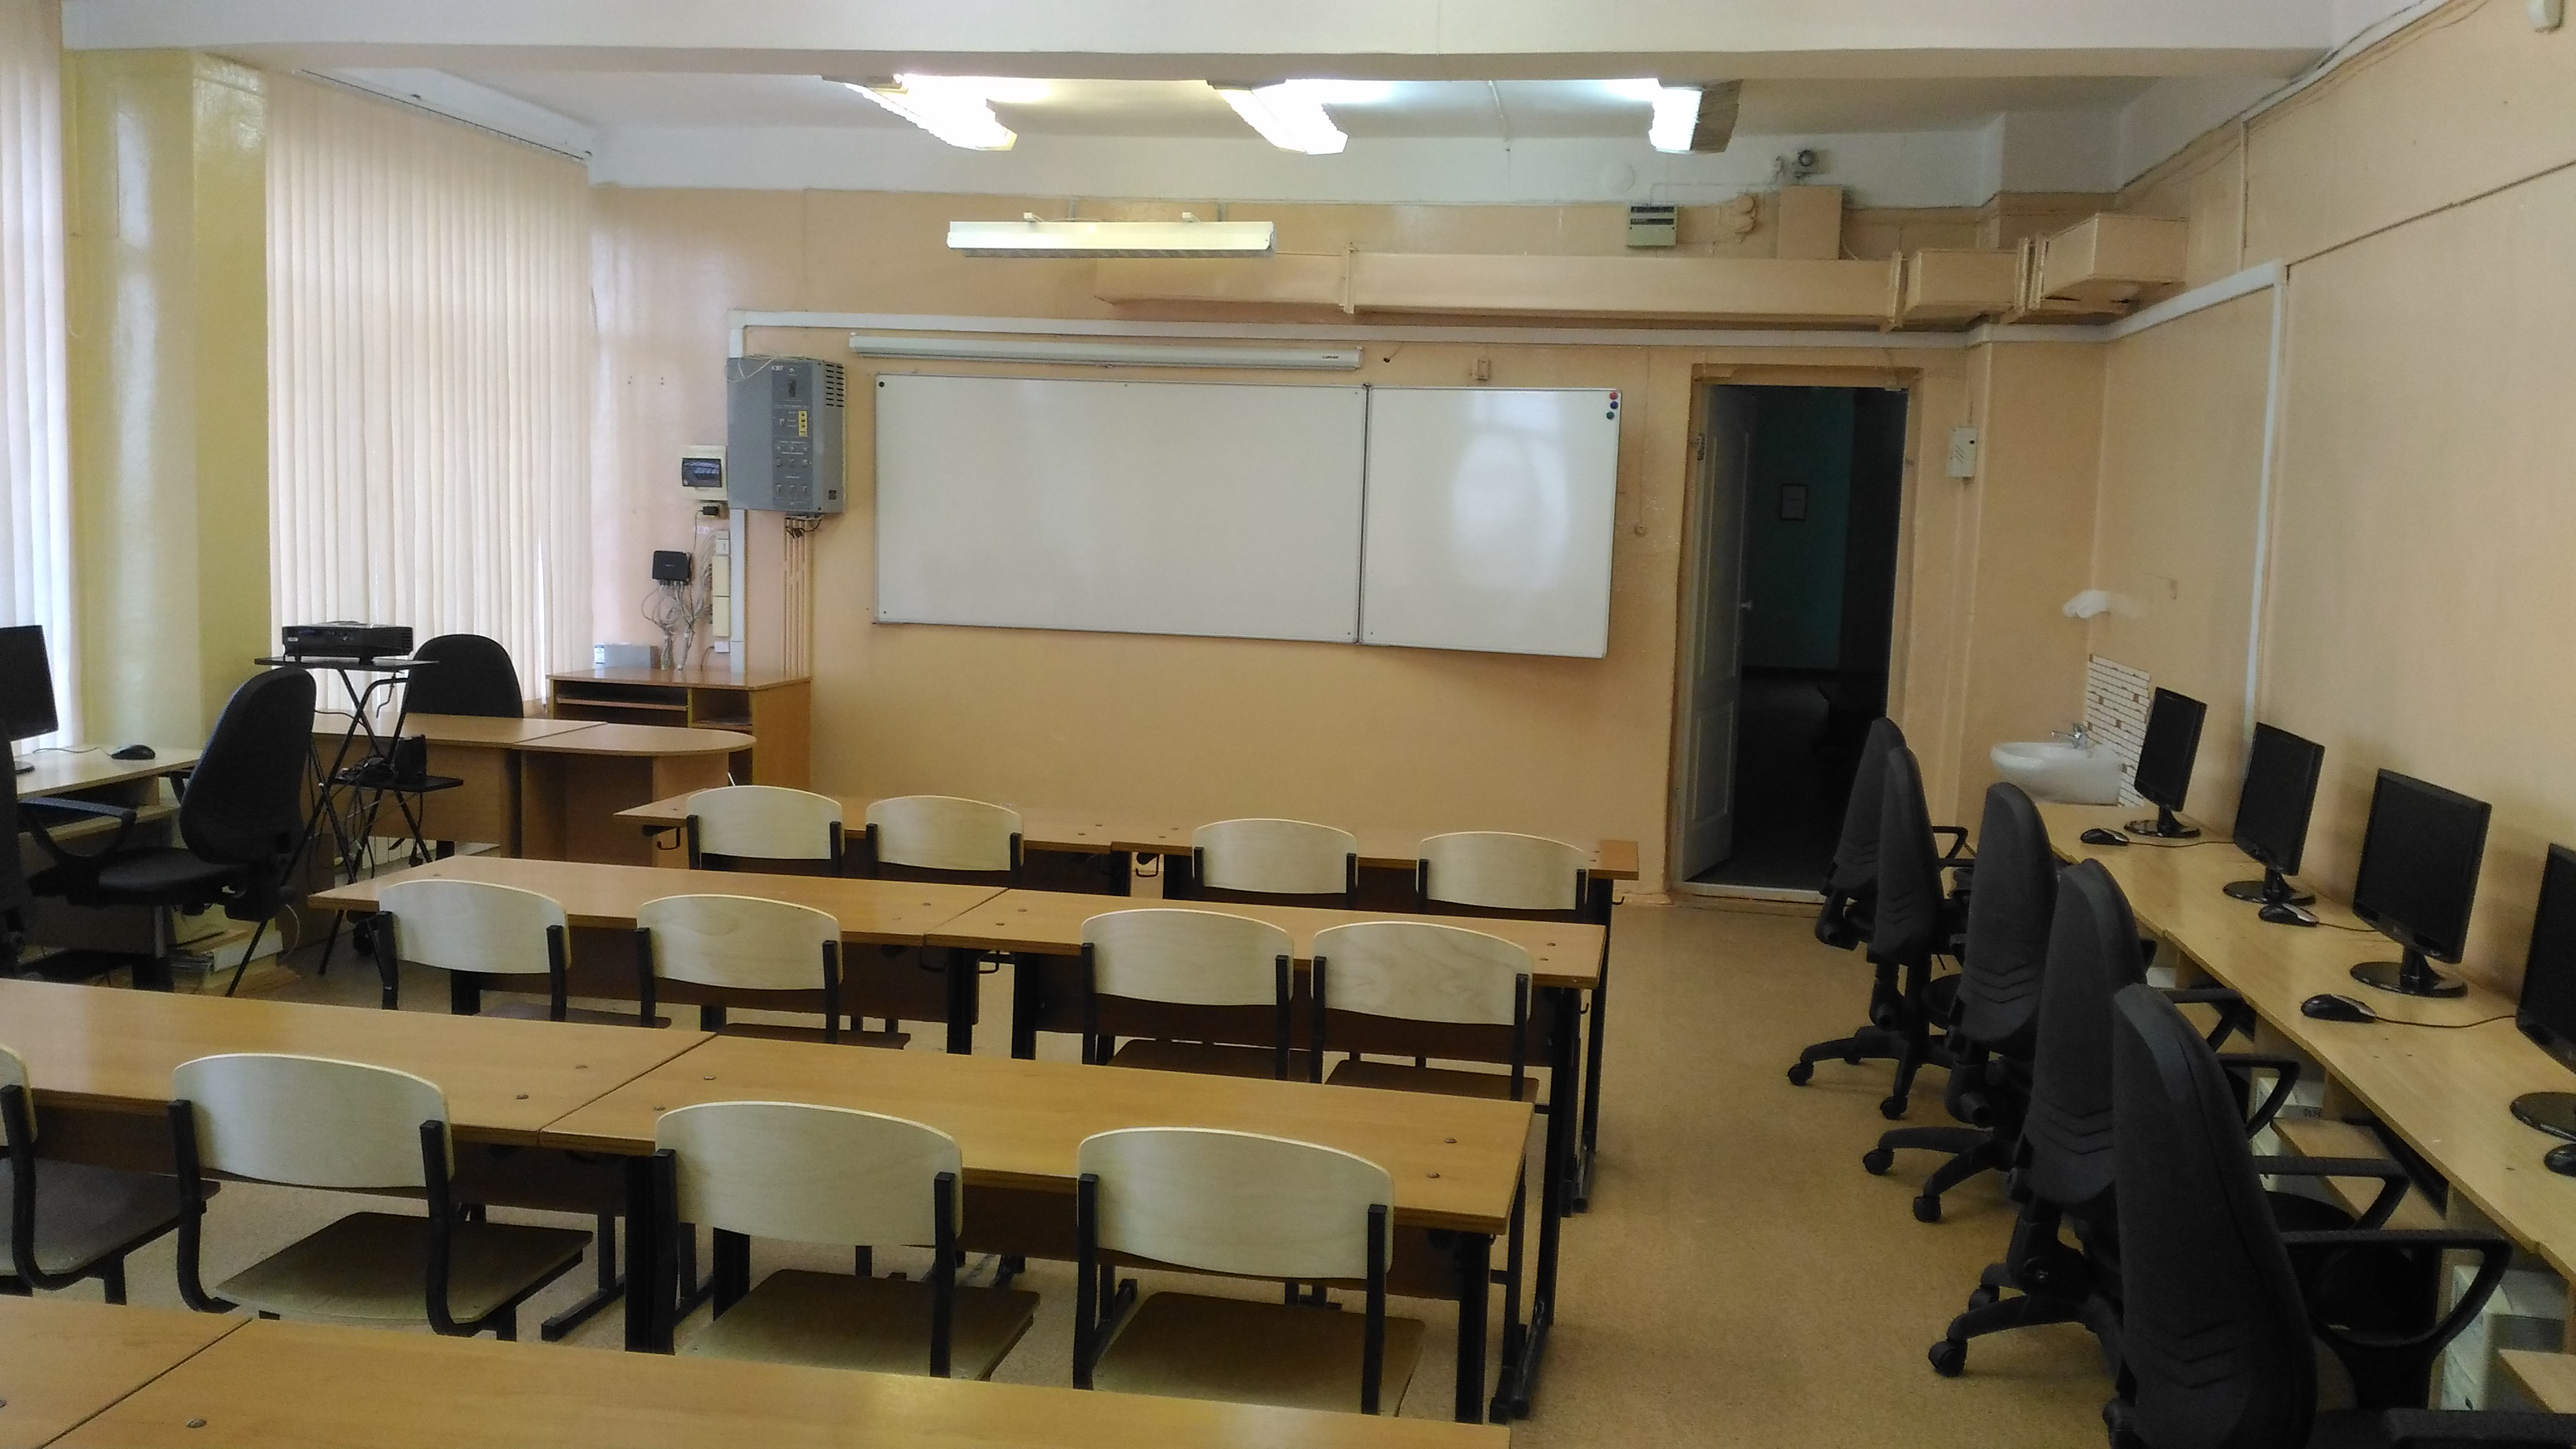 Кабинеты школы 28. Иркутск